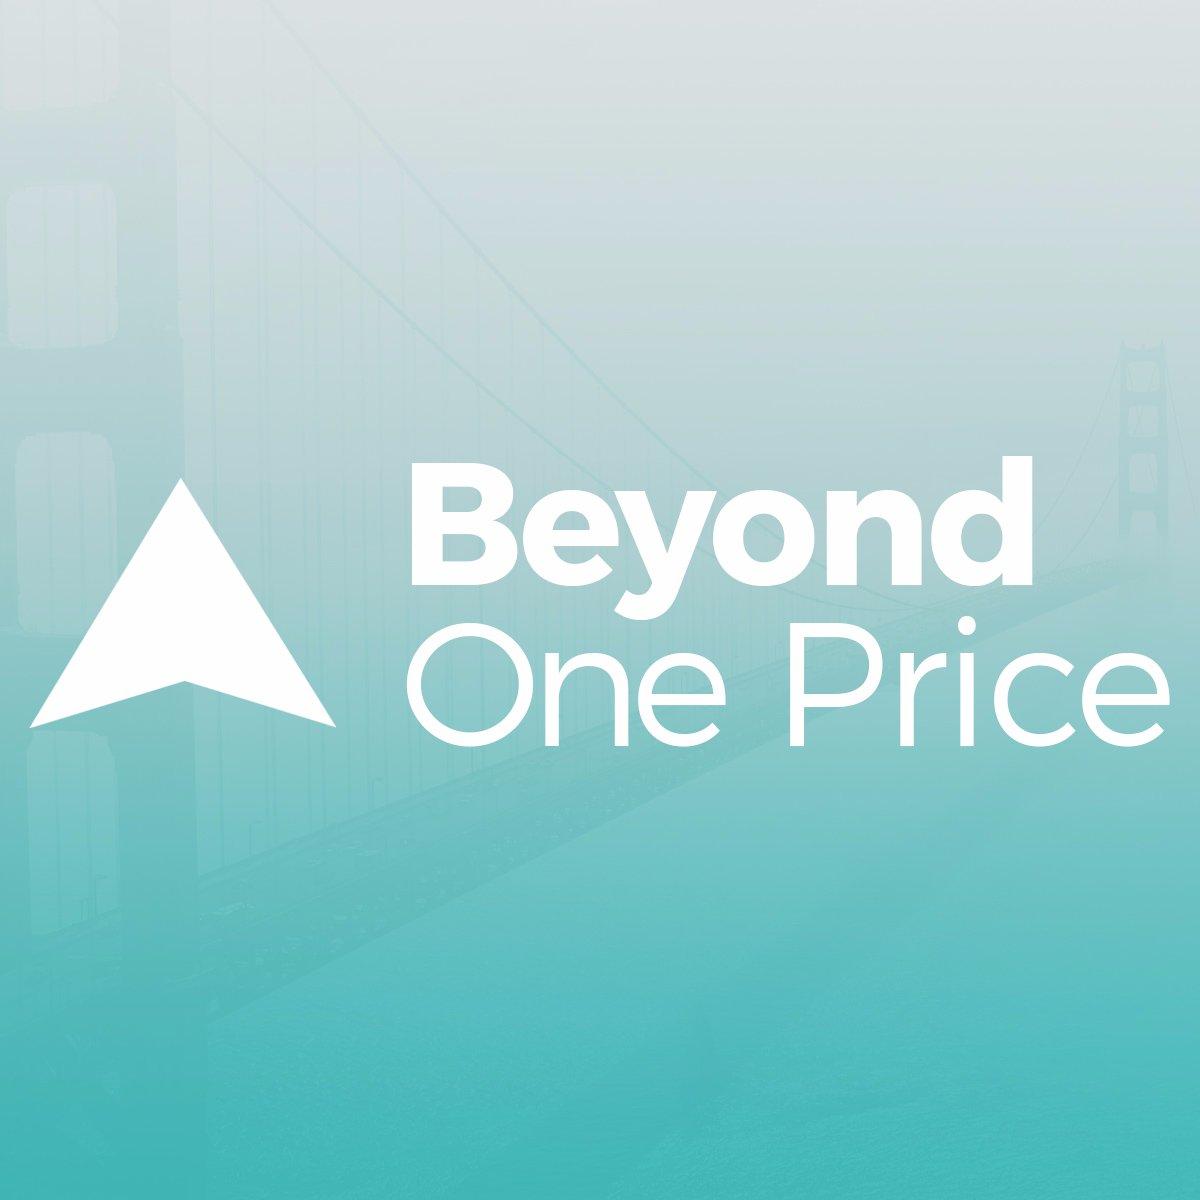 Beyond One Price